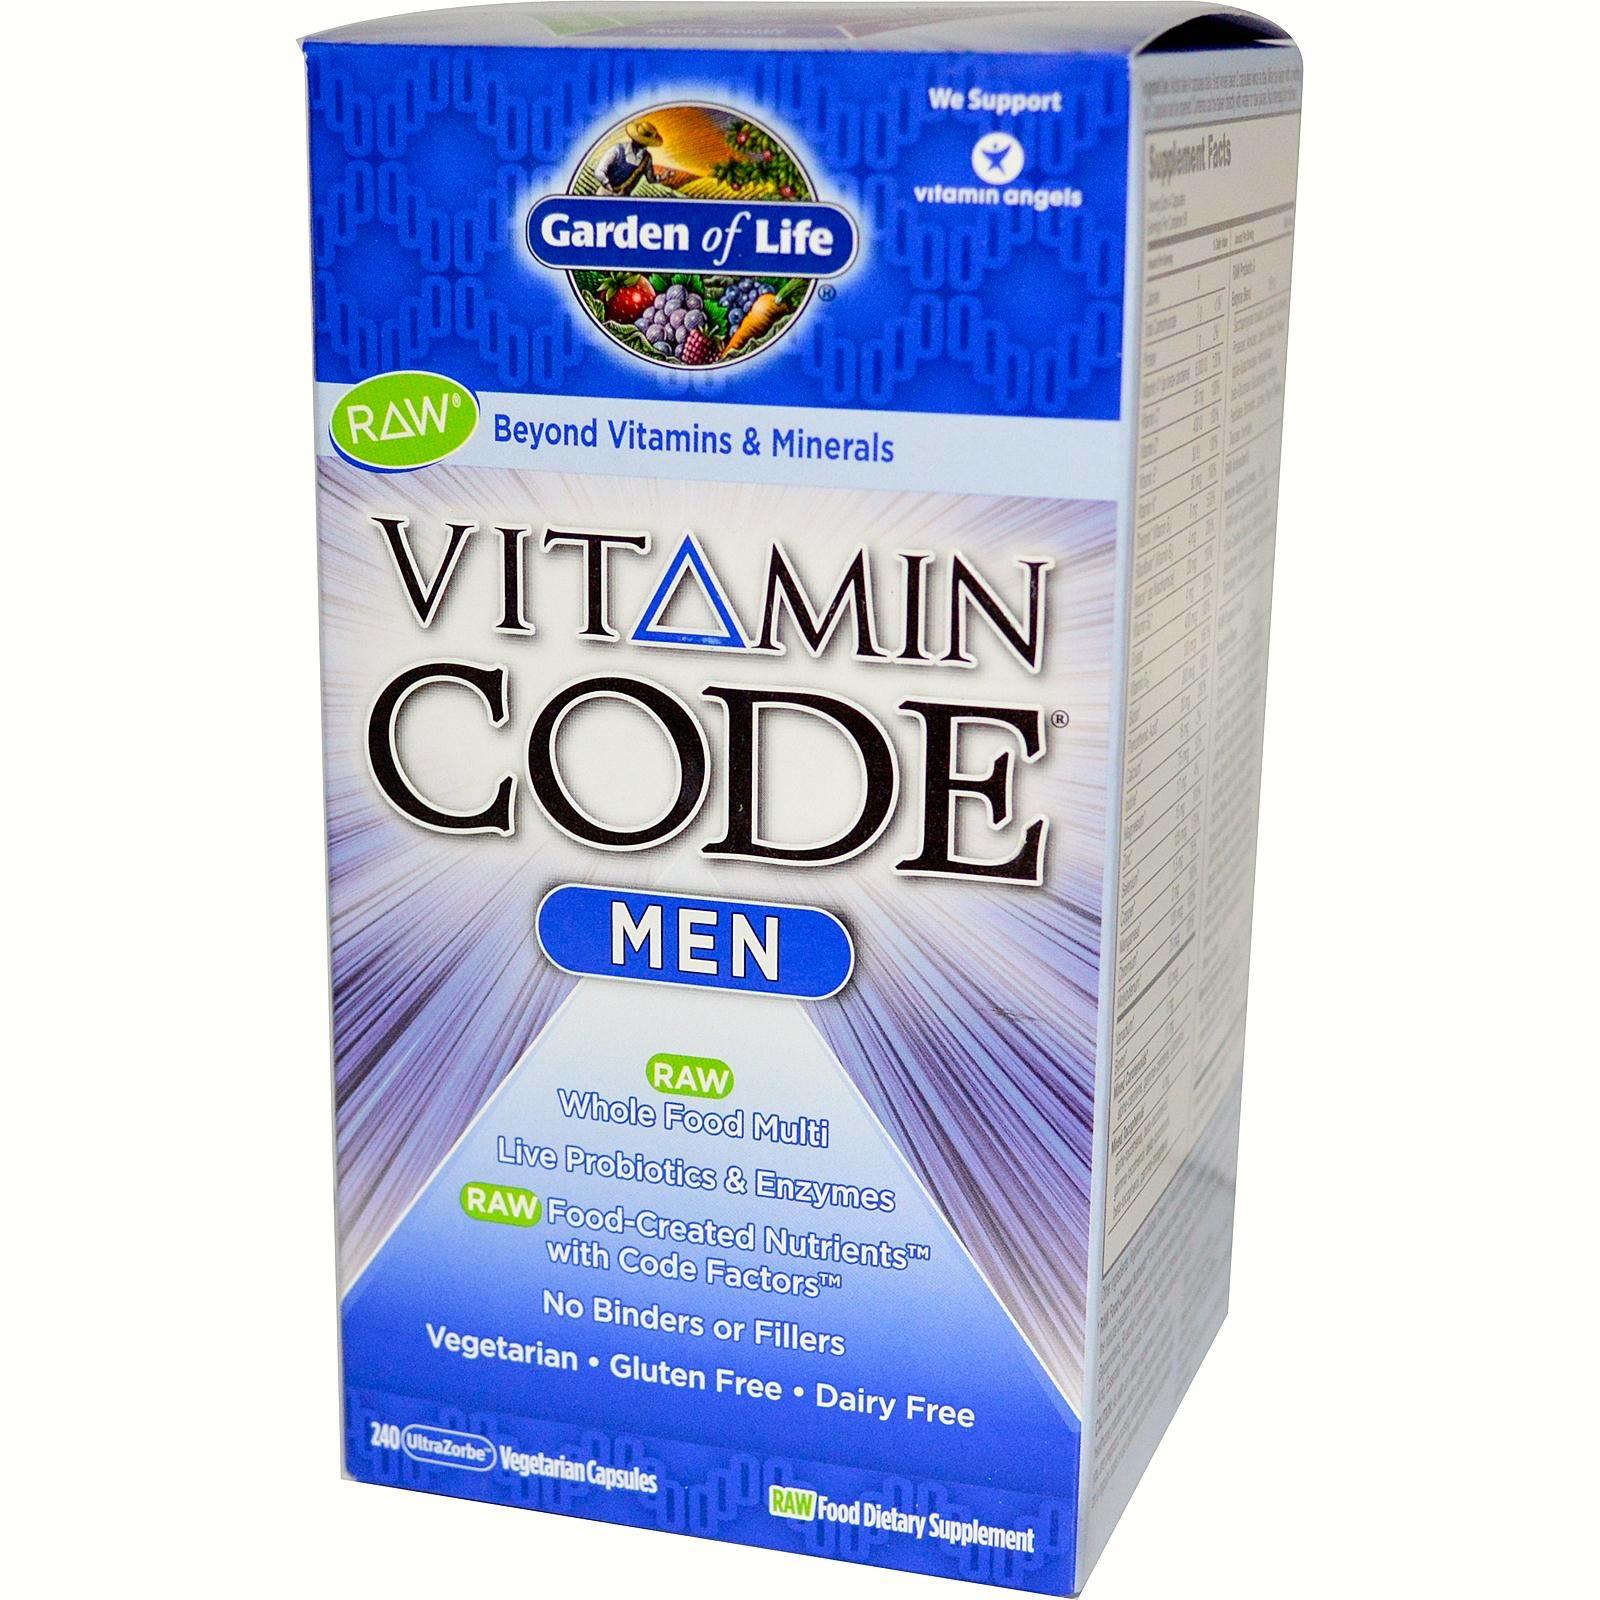 Vitamin Code Men By Garden Of Life 240 Caps White Dove Healing Arts Ltd